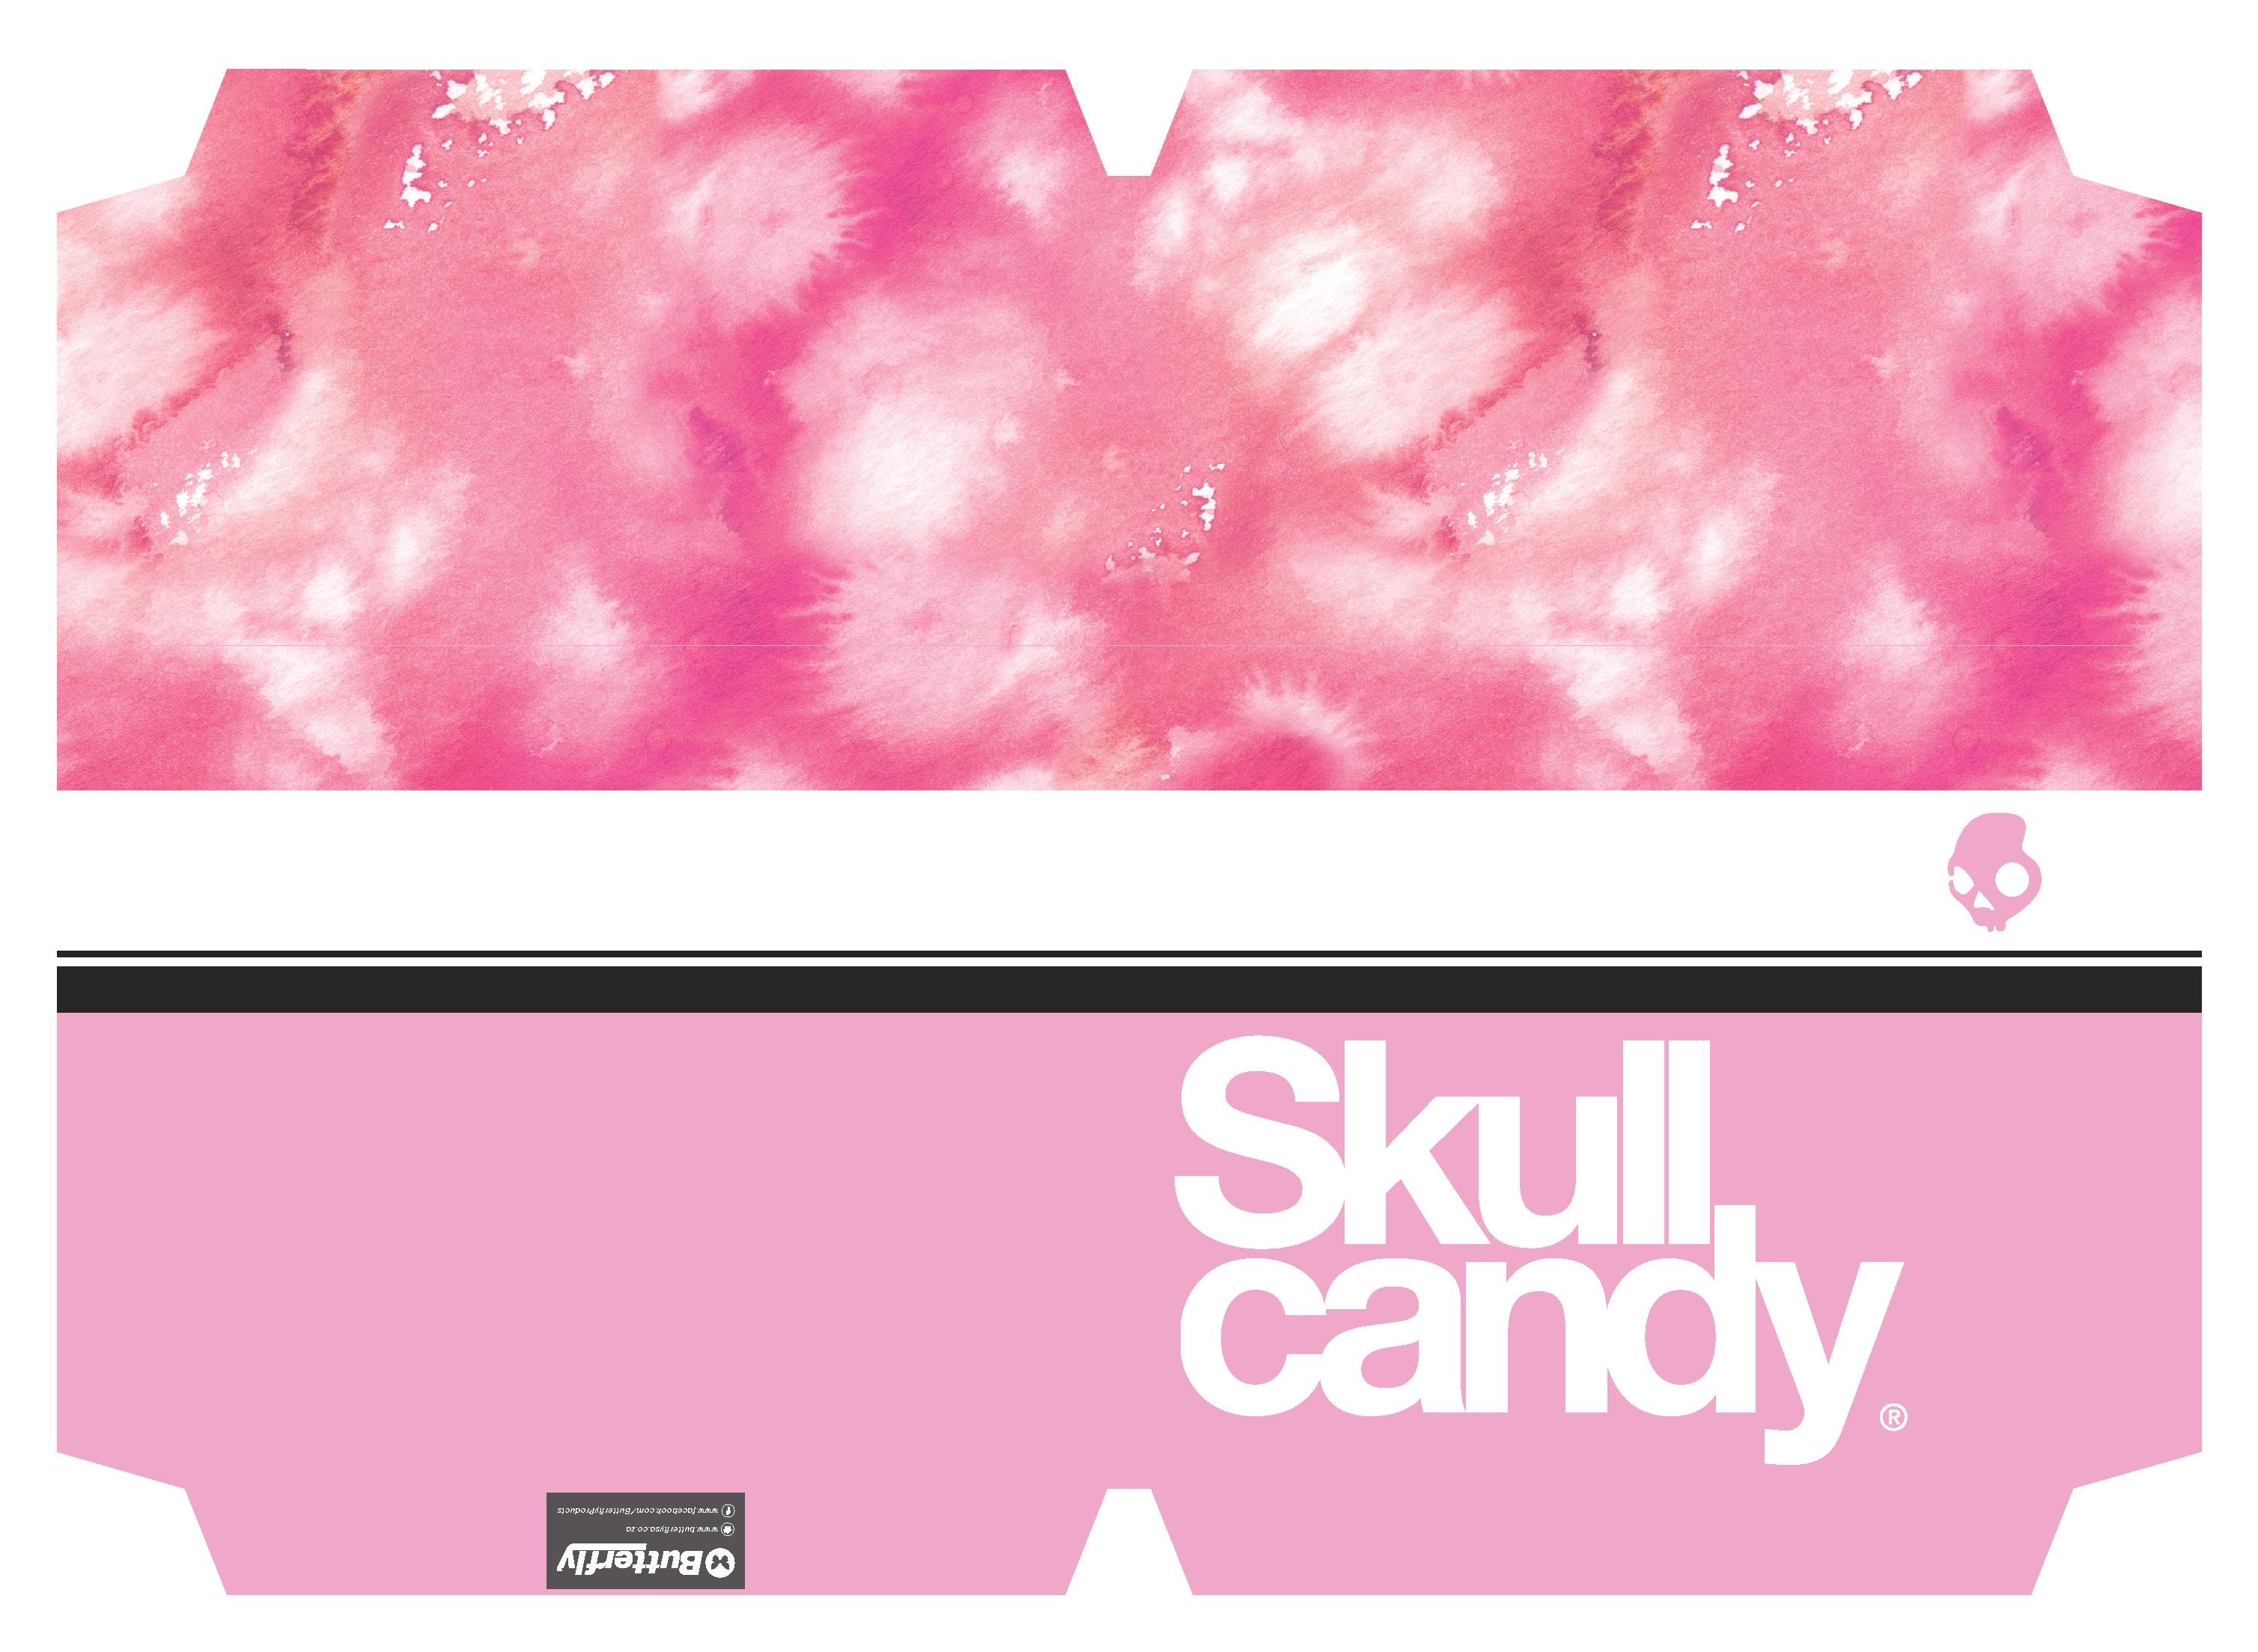 Skullcandy Girls - A4 Precut Book Cover - 5 Pack